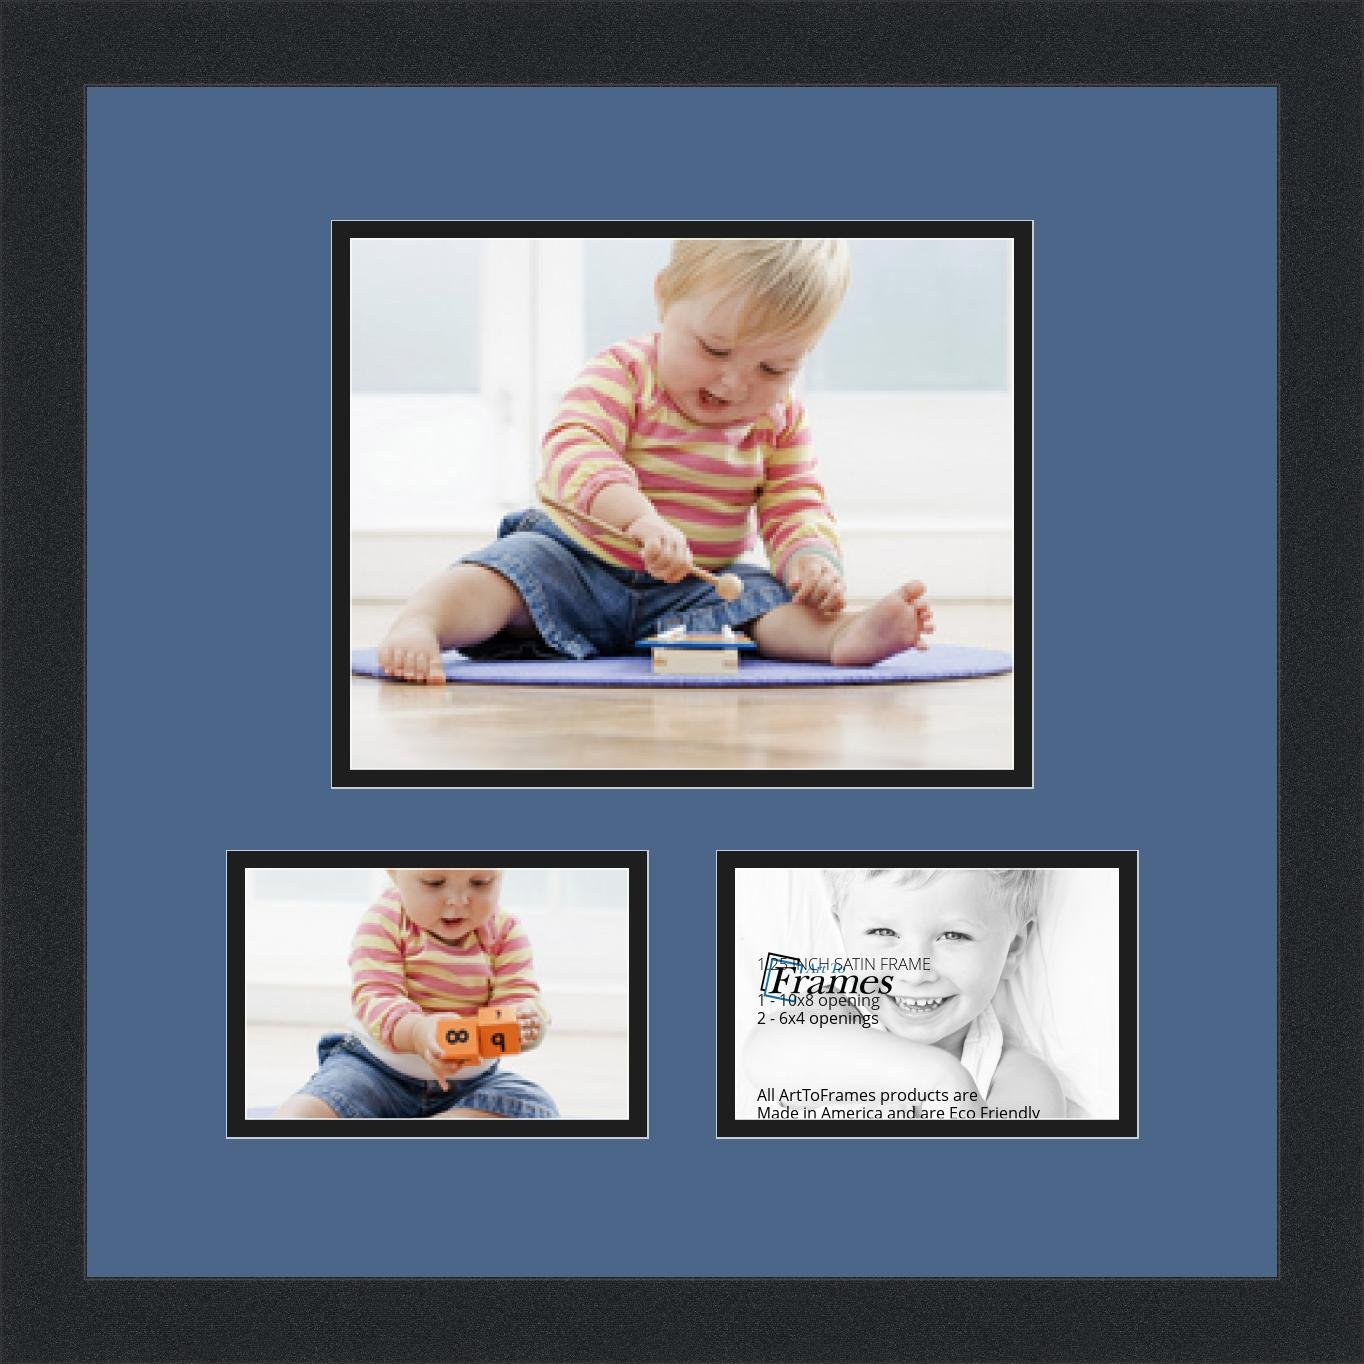 arttoframes alphabet写真画像フレームwith 1 8 5 x 11 and 2 11 x